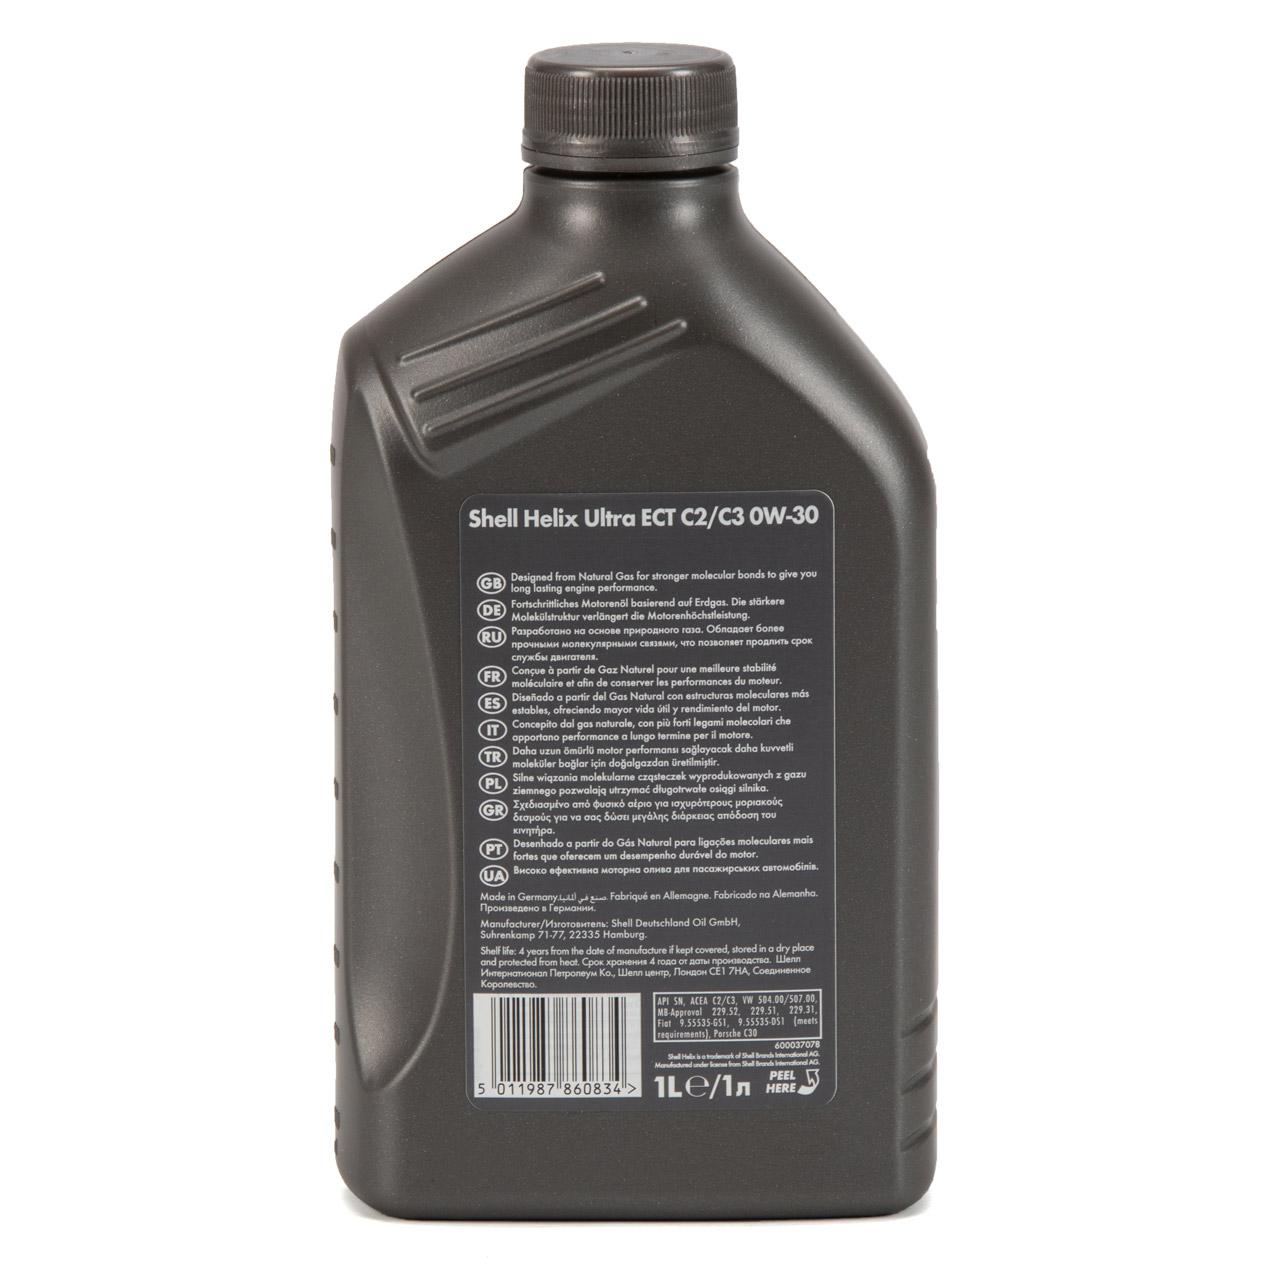 SHELL Motoröl Öl HELIX ULTRA ECT C2/C3 0W30 VW 50400/50700 MB 229.52 - 1 Liter